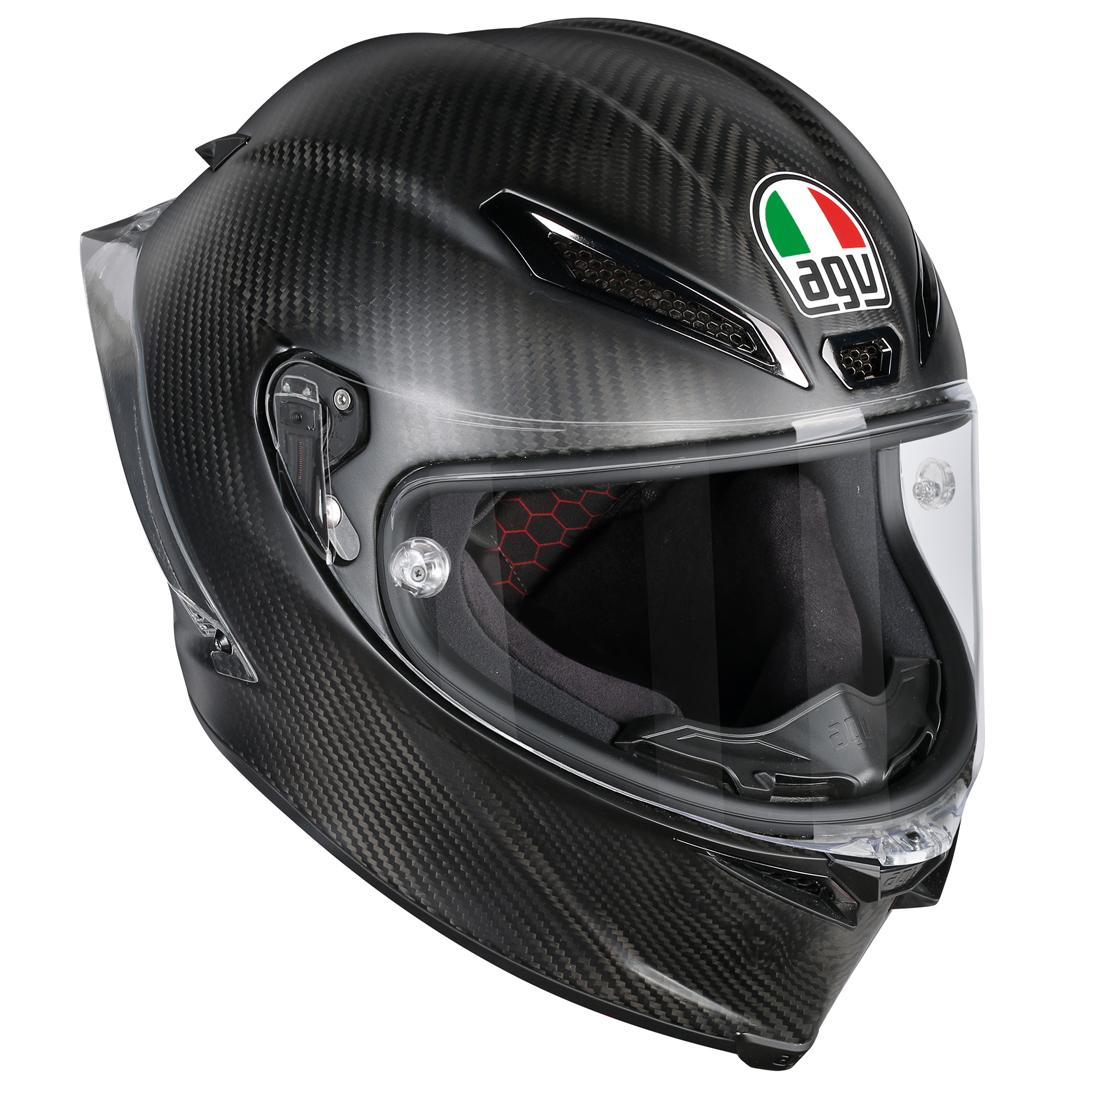 AGV フルフェイスヘルメット PISTA GPR SOLID M.CARBON Mサイズ 忘年会 年末年始のご挨拶 売れ行きがよい 海外 ブランド セット 新年会 送料無料 楽天年間ランキング受賞 お祝い